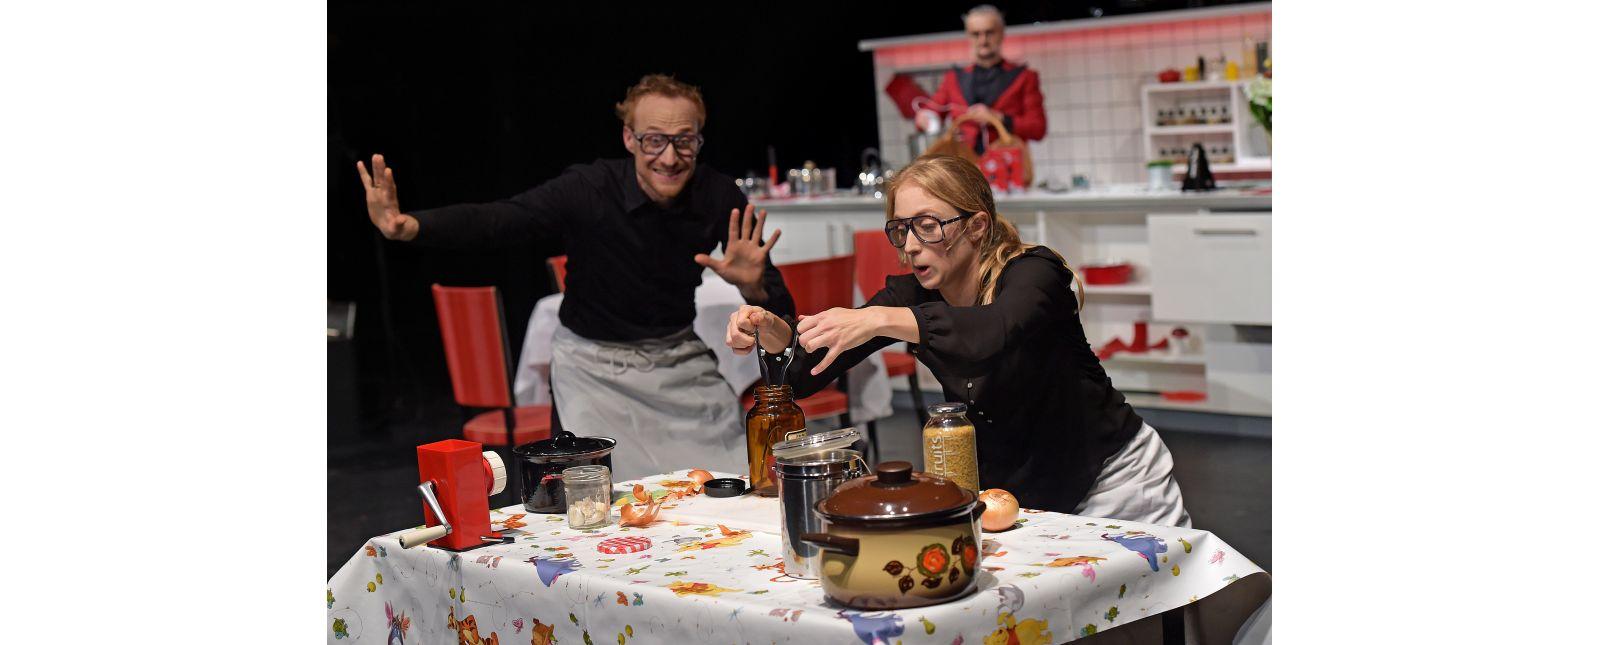 Teufels Küche // Philipp Schiemenz, Mariella Bachmann, Klaus Simon // 2017 // Foto: Maurice Korbel